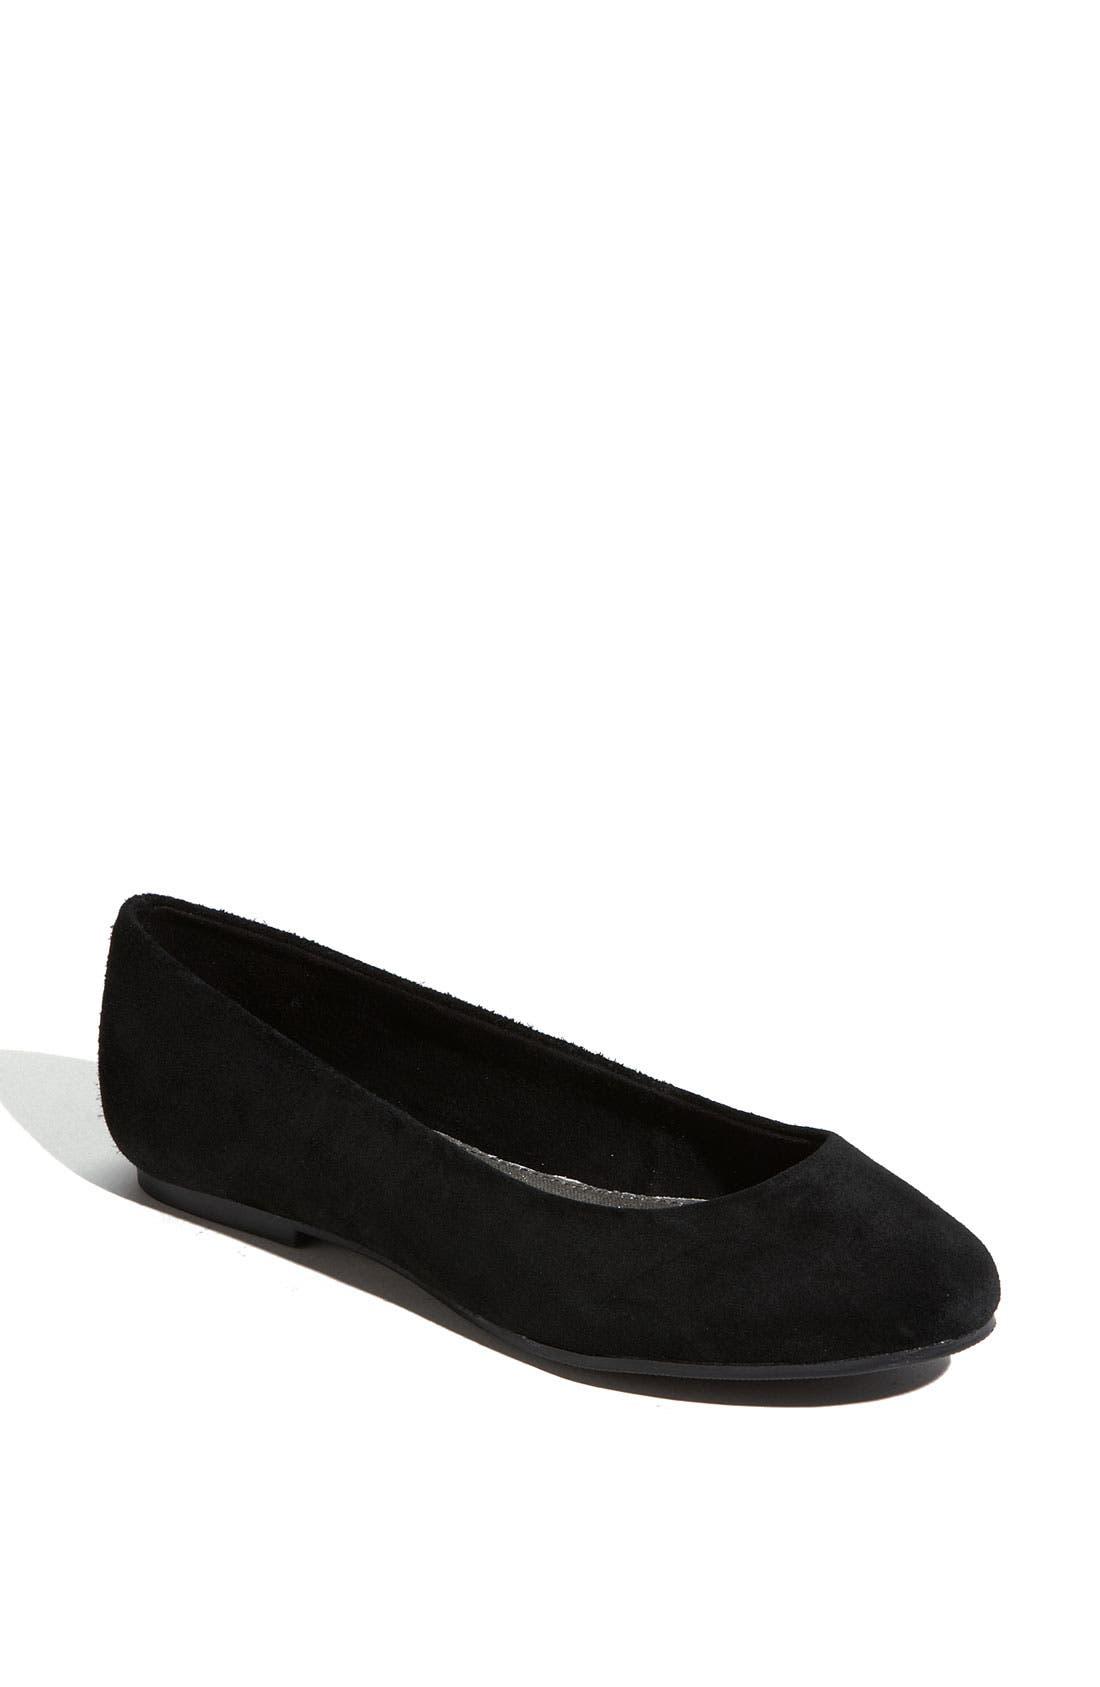 Alternate Image 1 Selected - BC Footwear 'Limousine' Suede Flat